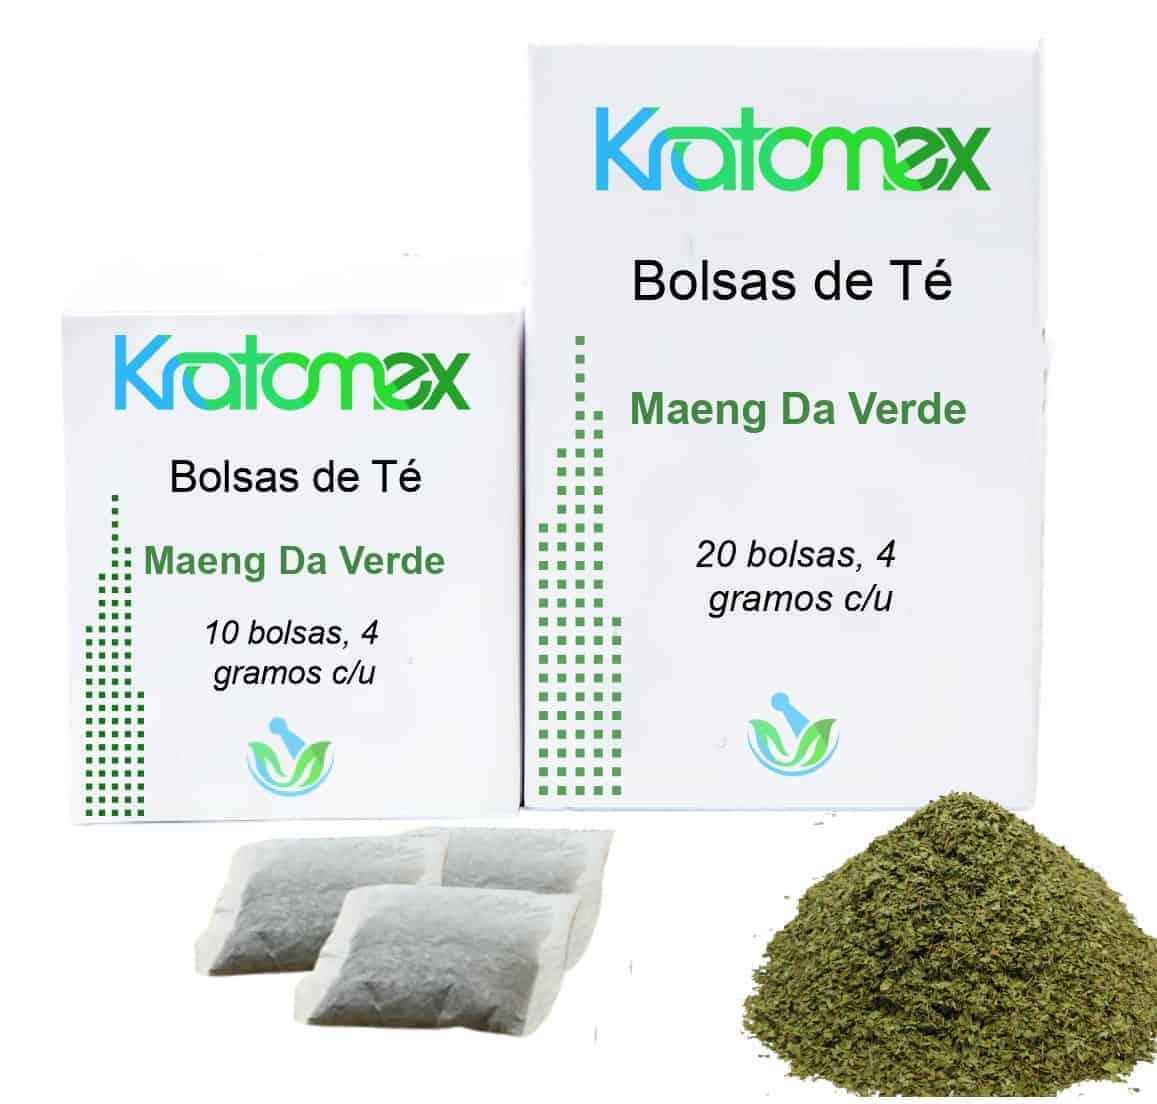 Cajas de Bolsas de Té de Maeng Da Verde Kratom y hojas de Maeng Da Verde Kratom